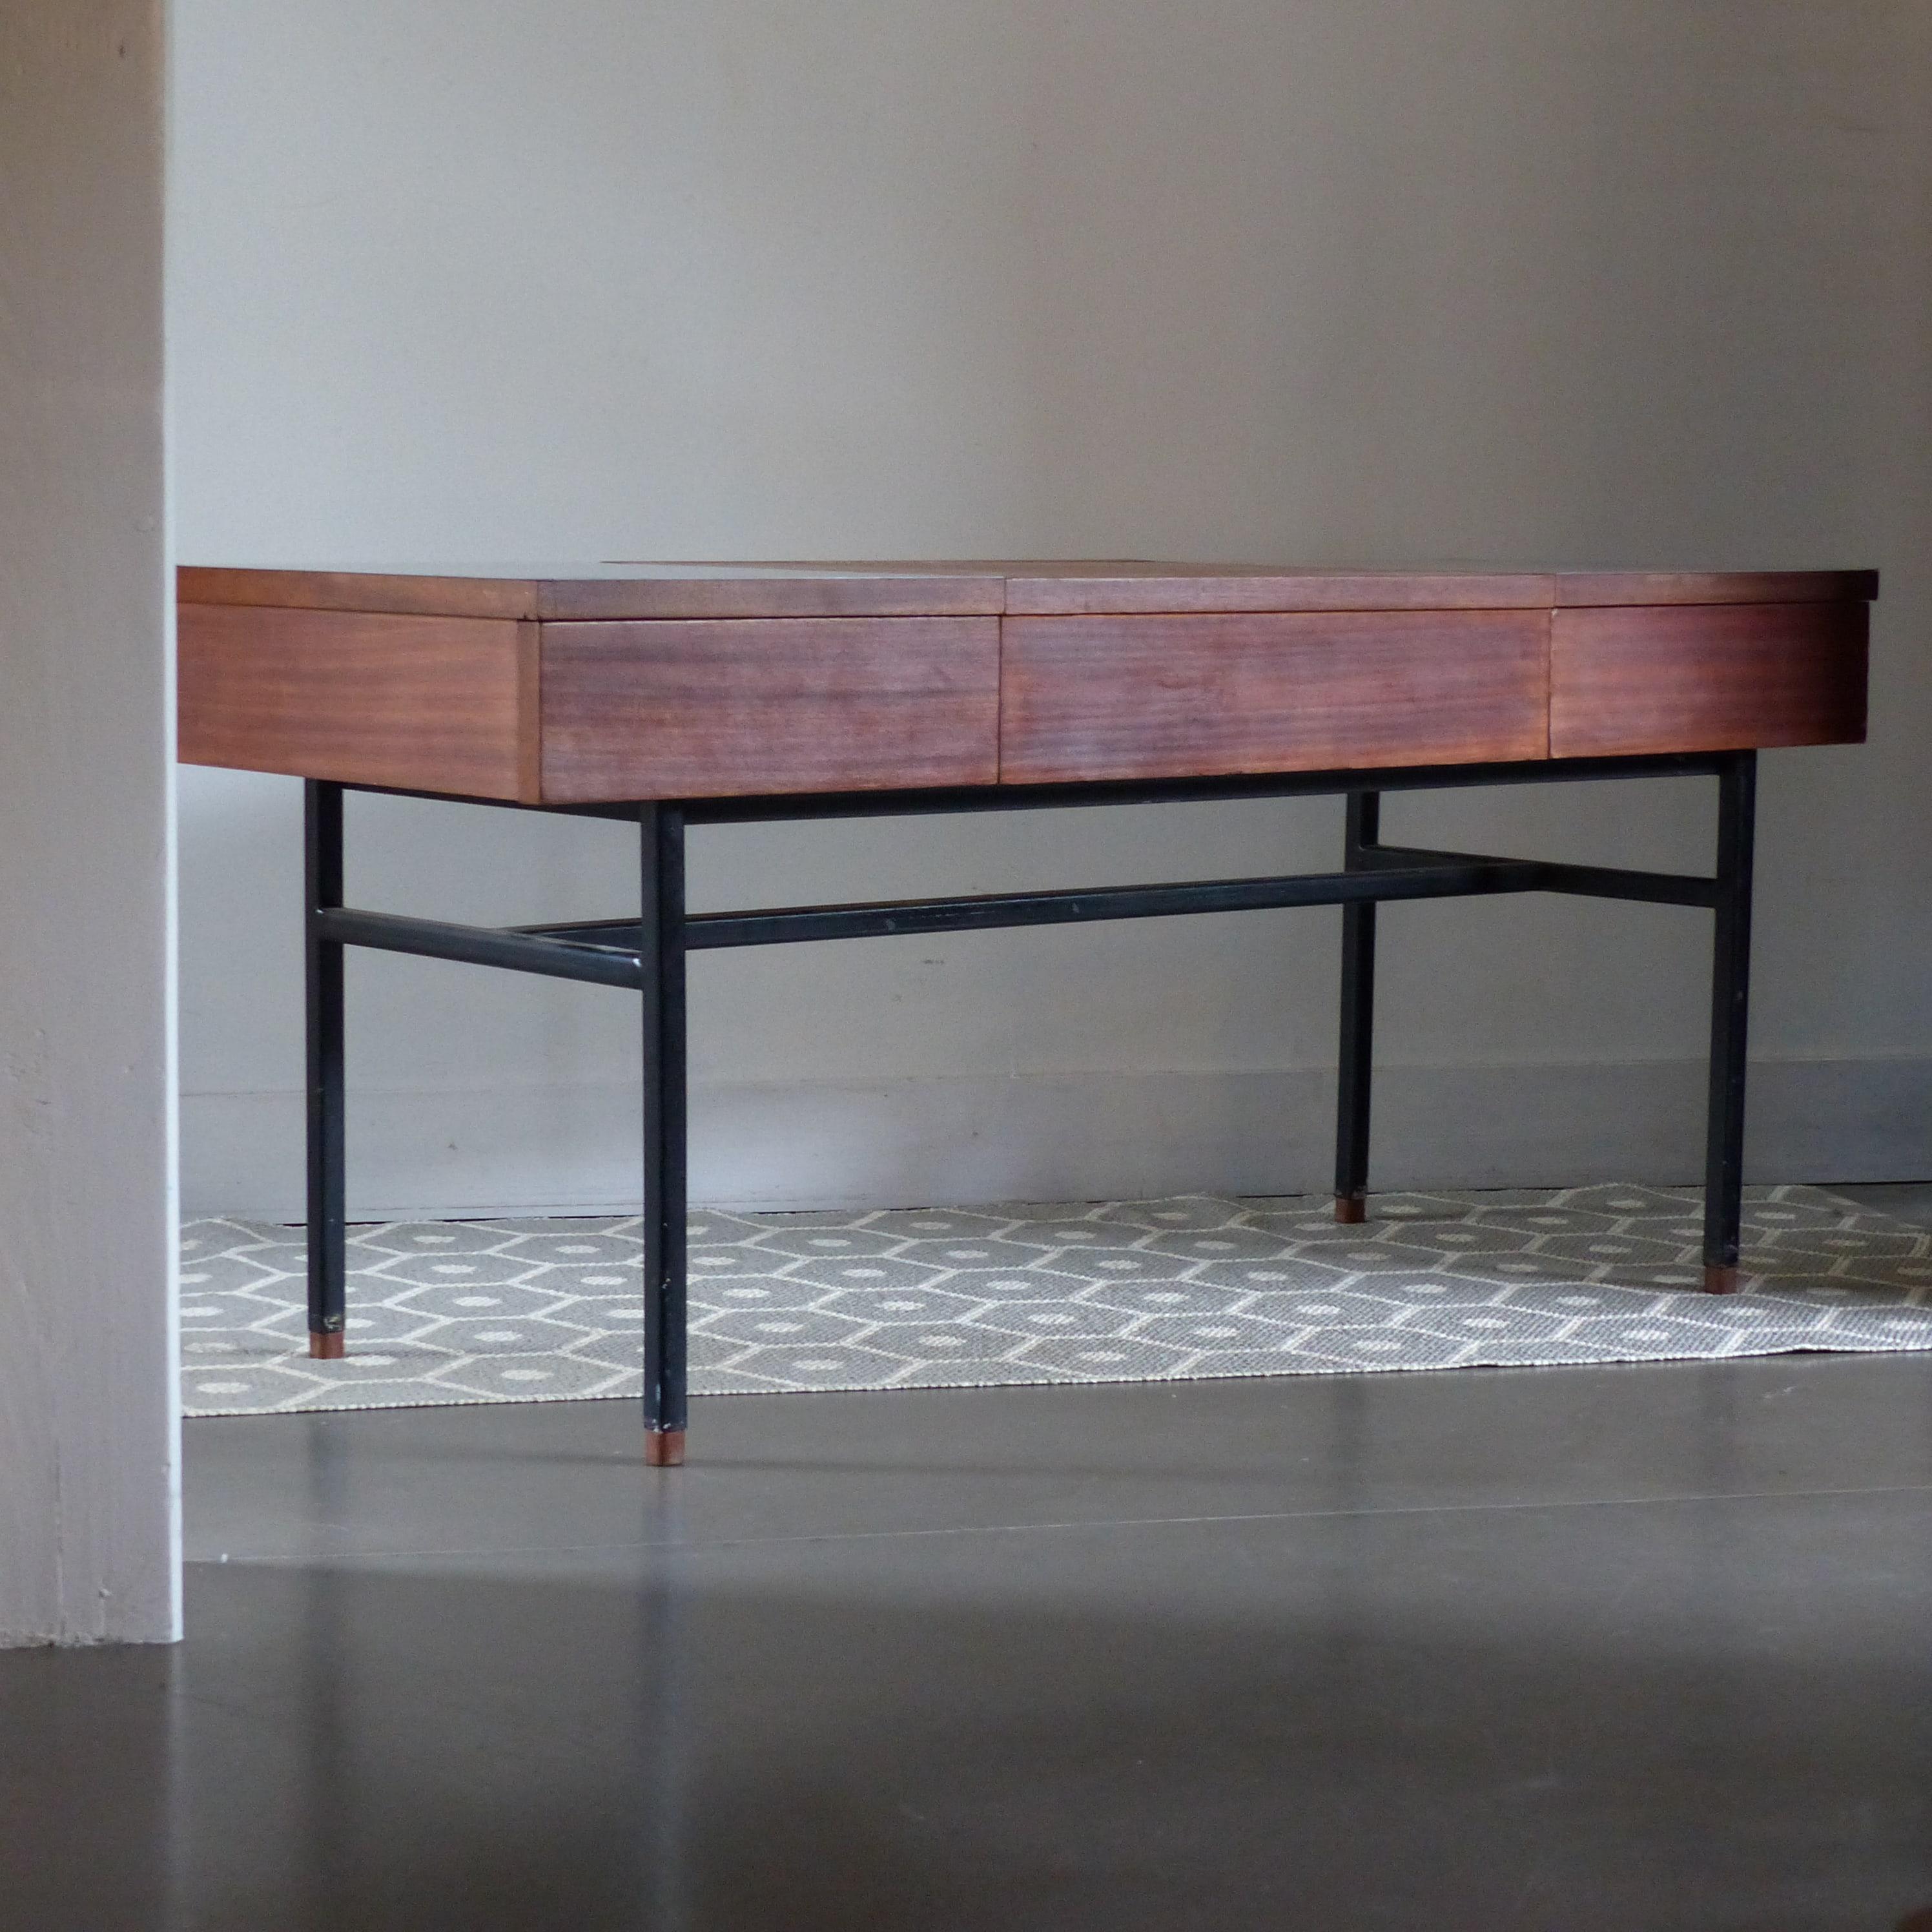 coiffeuse enfilade d 39 alain richard lignedebrocante brocante en ligne chine pour vous meubles. Black Bedroom Furniture Sets. Home Design Ideas